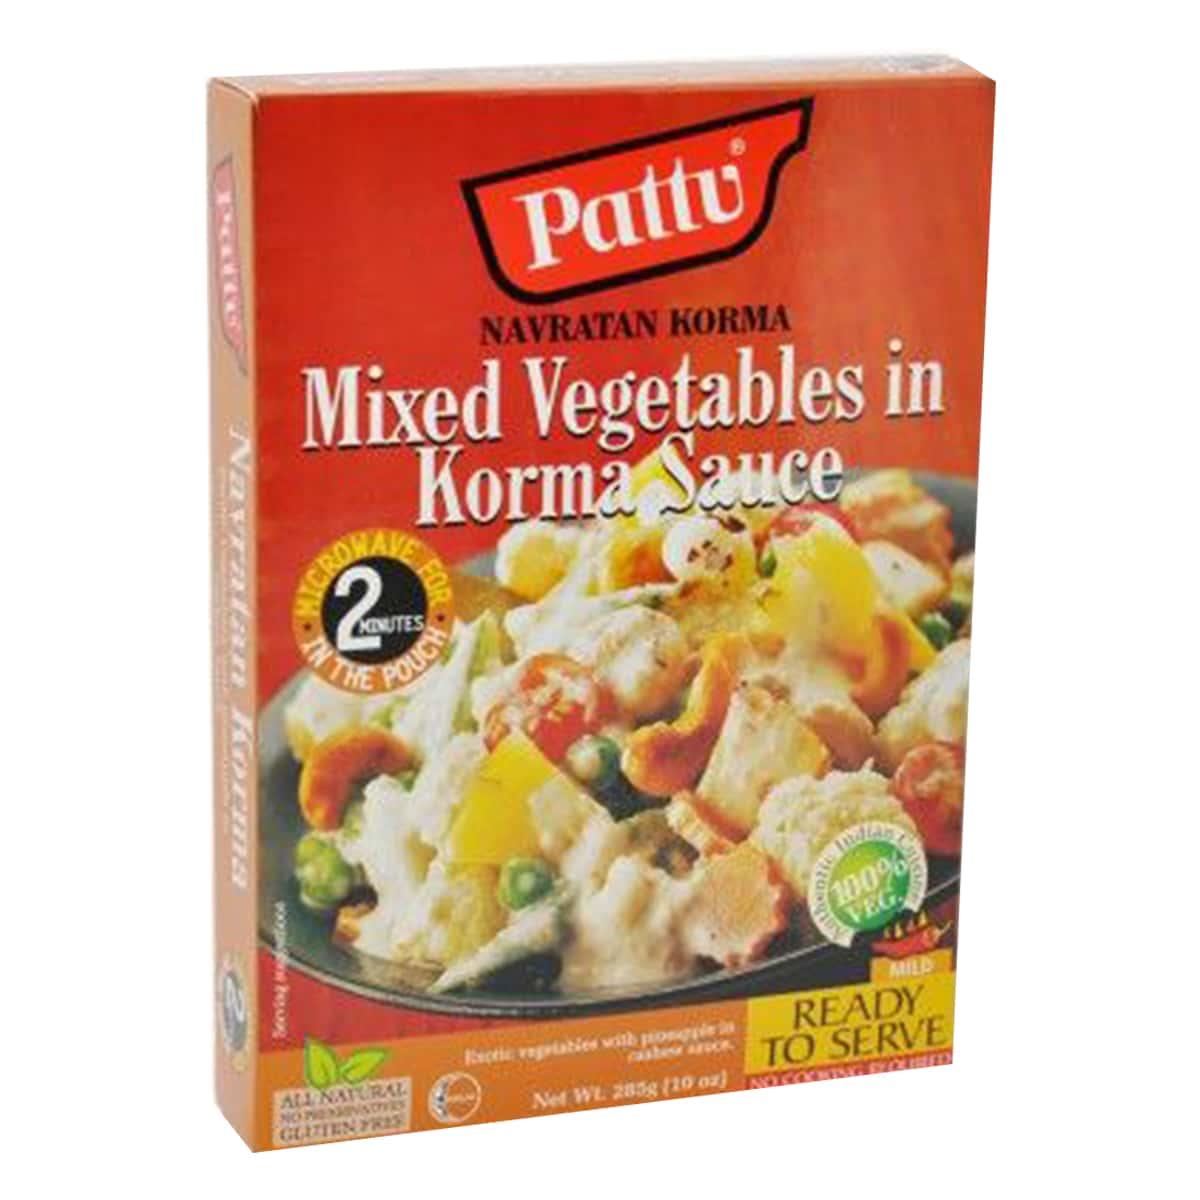 Buy Pattu Navratan Korma (Mixed Vegetables in Korma Sauce) Ready to Serve - 285 gm